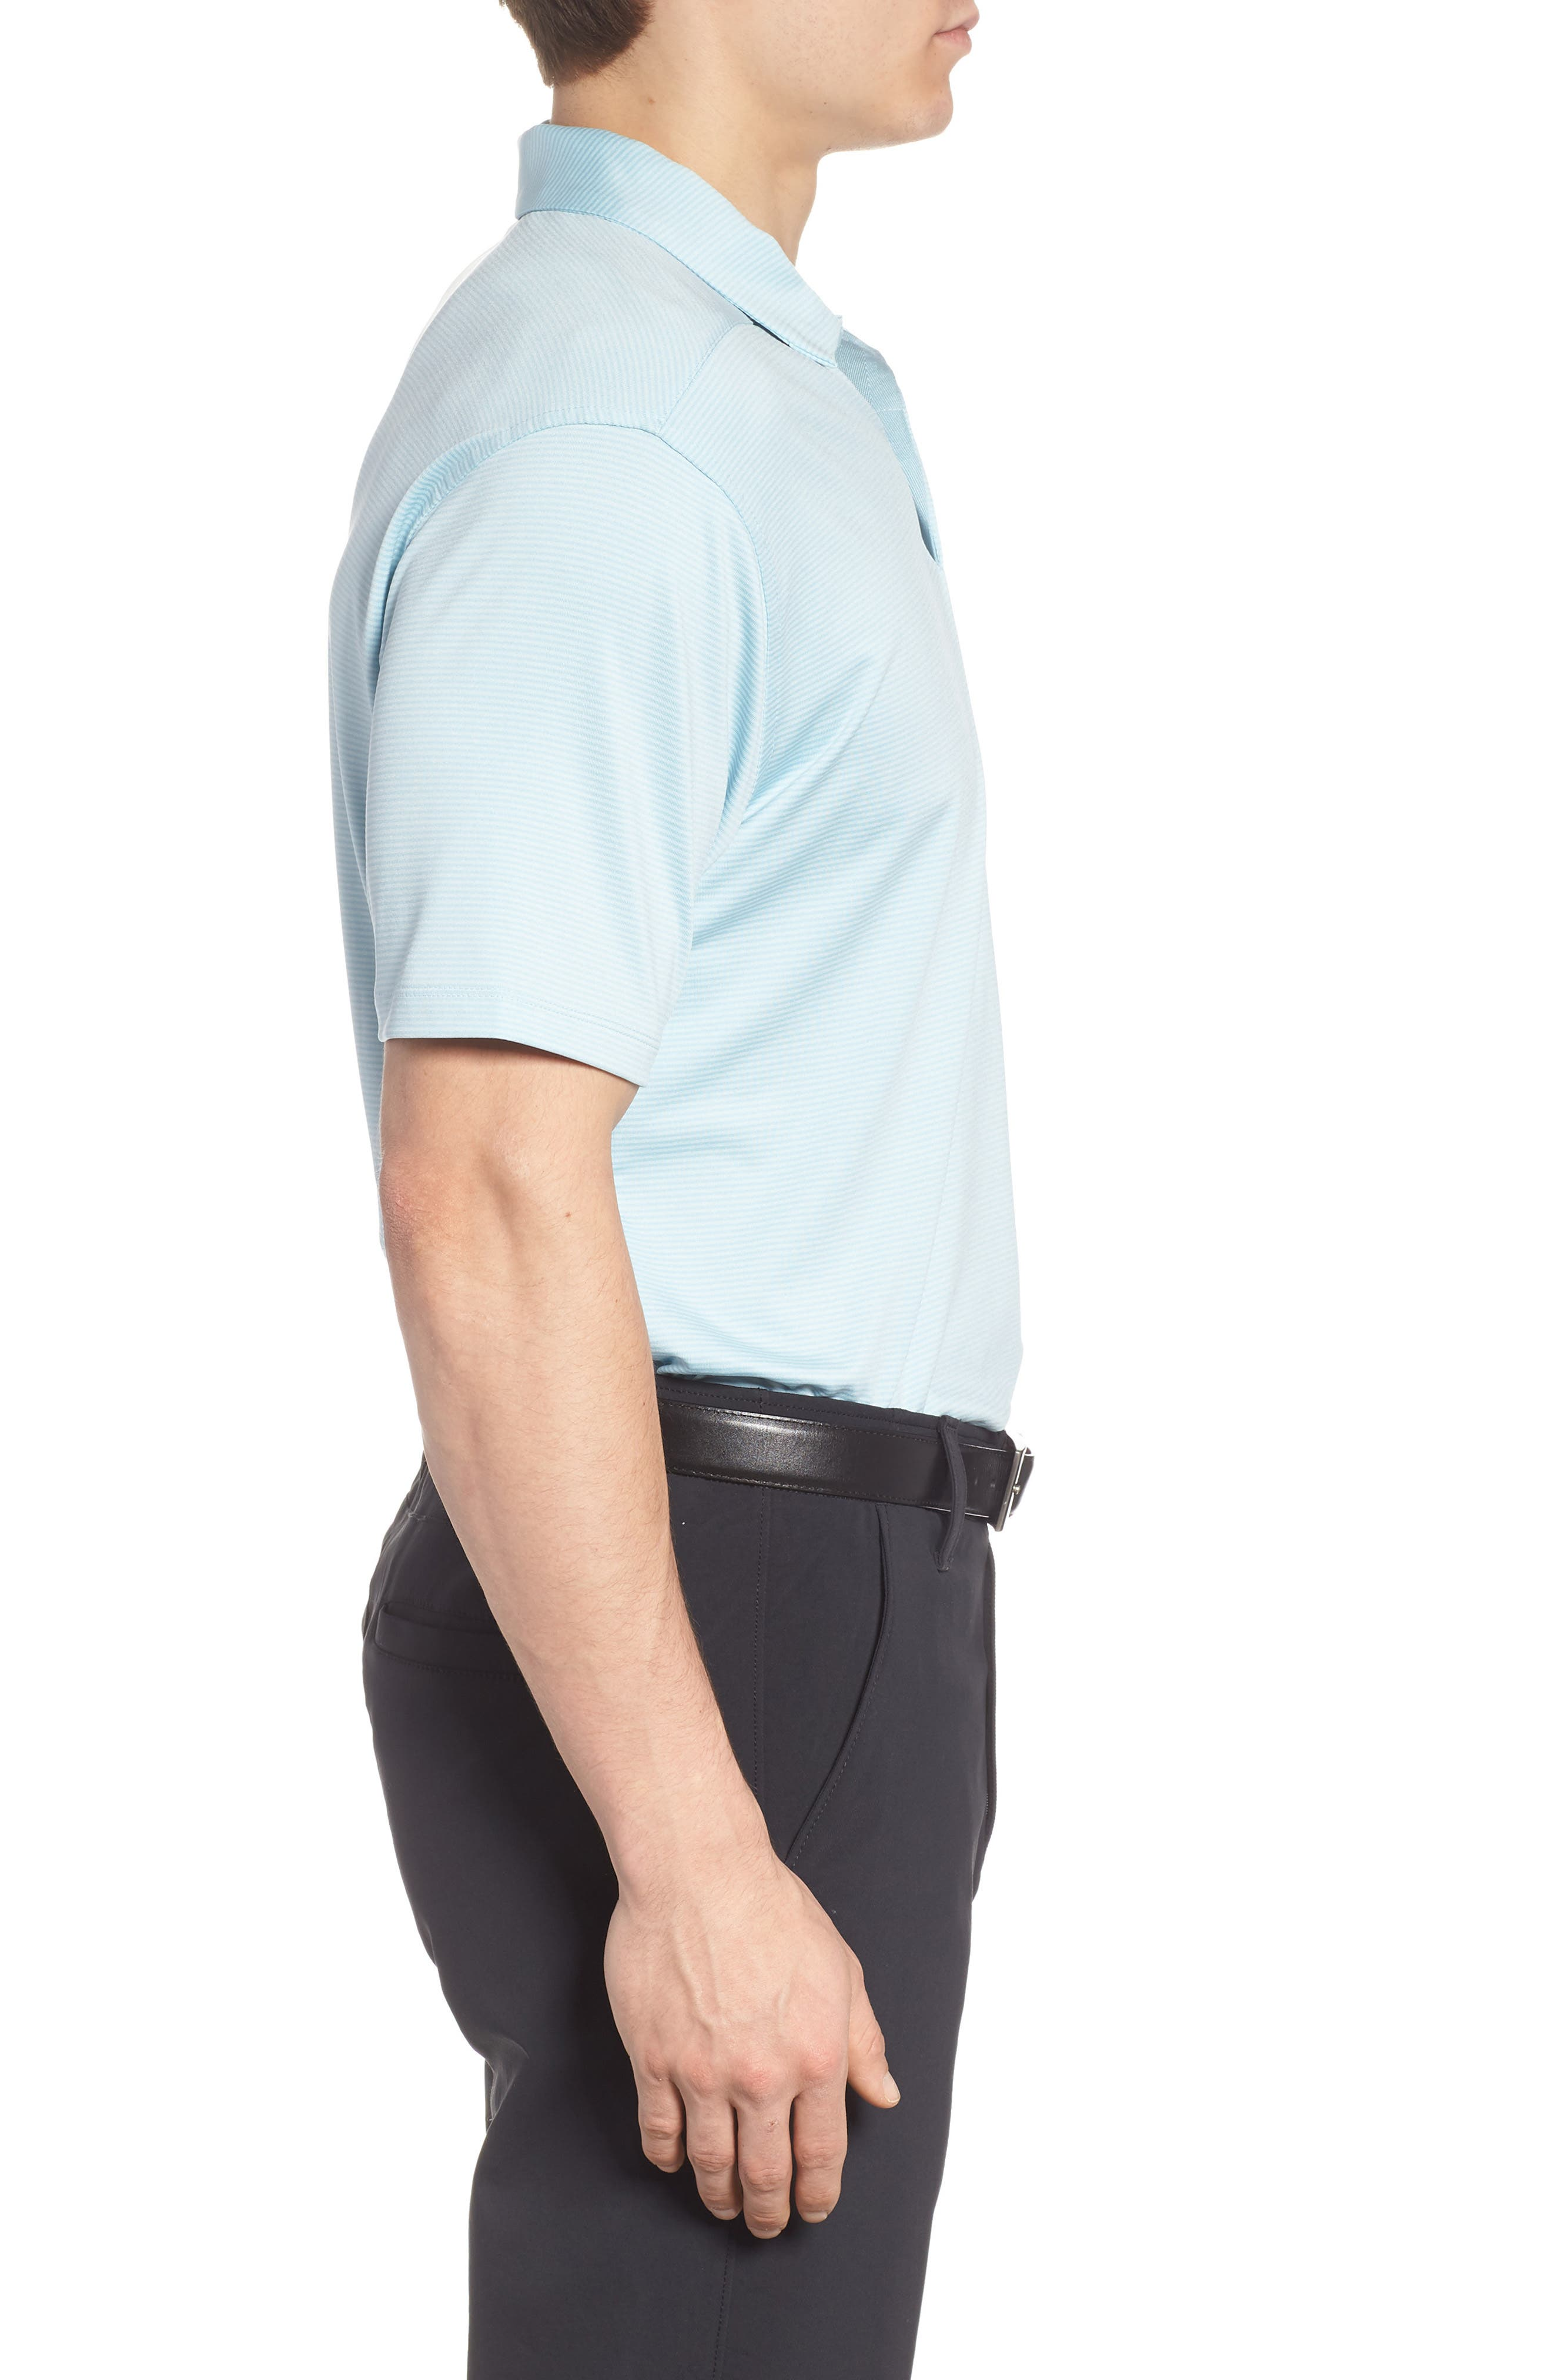 Dry Polo Shirt,                             Alternate thumbnail 3, color,                             OCEAN BLISS/ SILVER